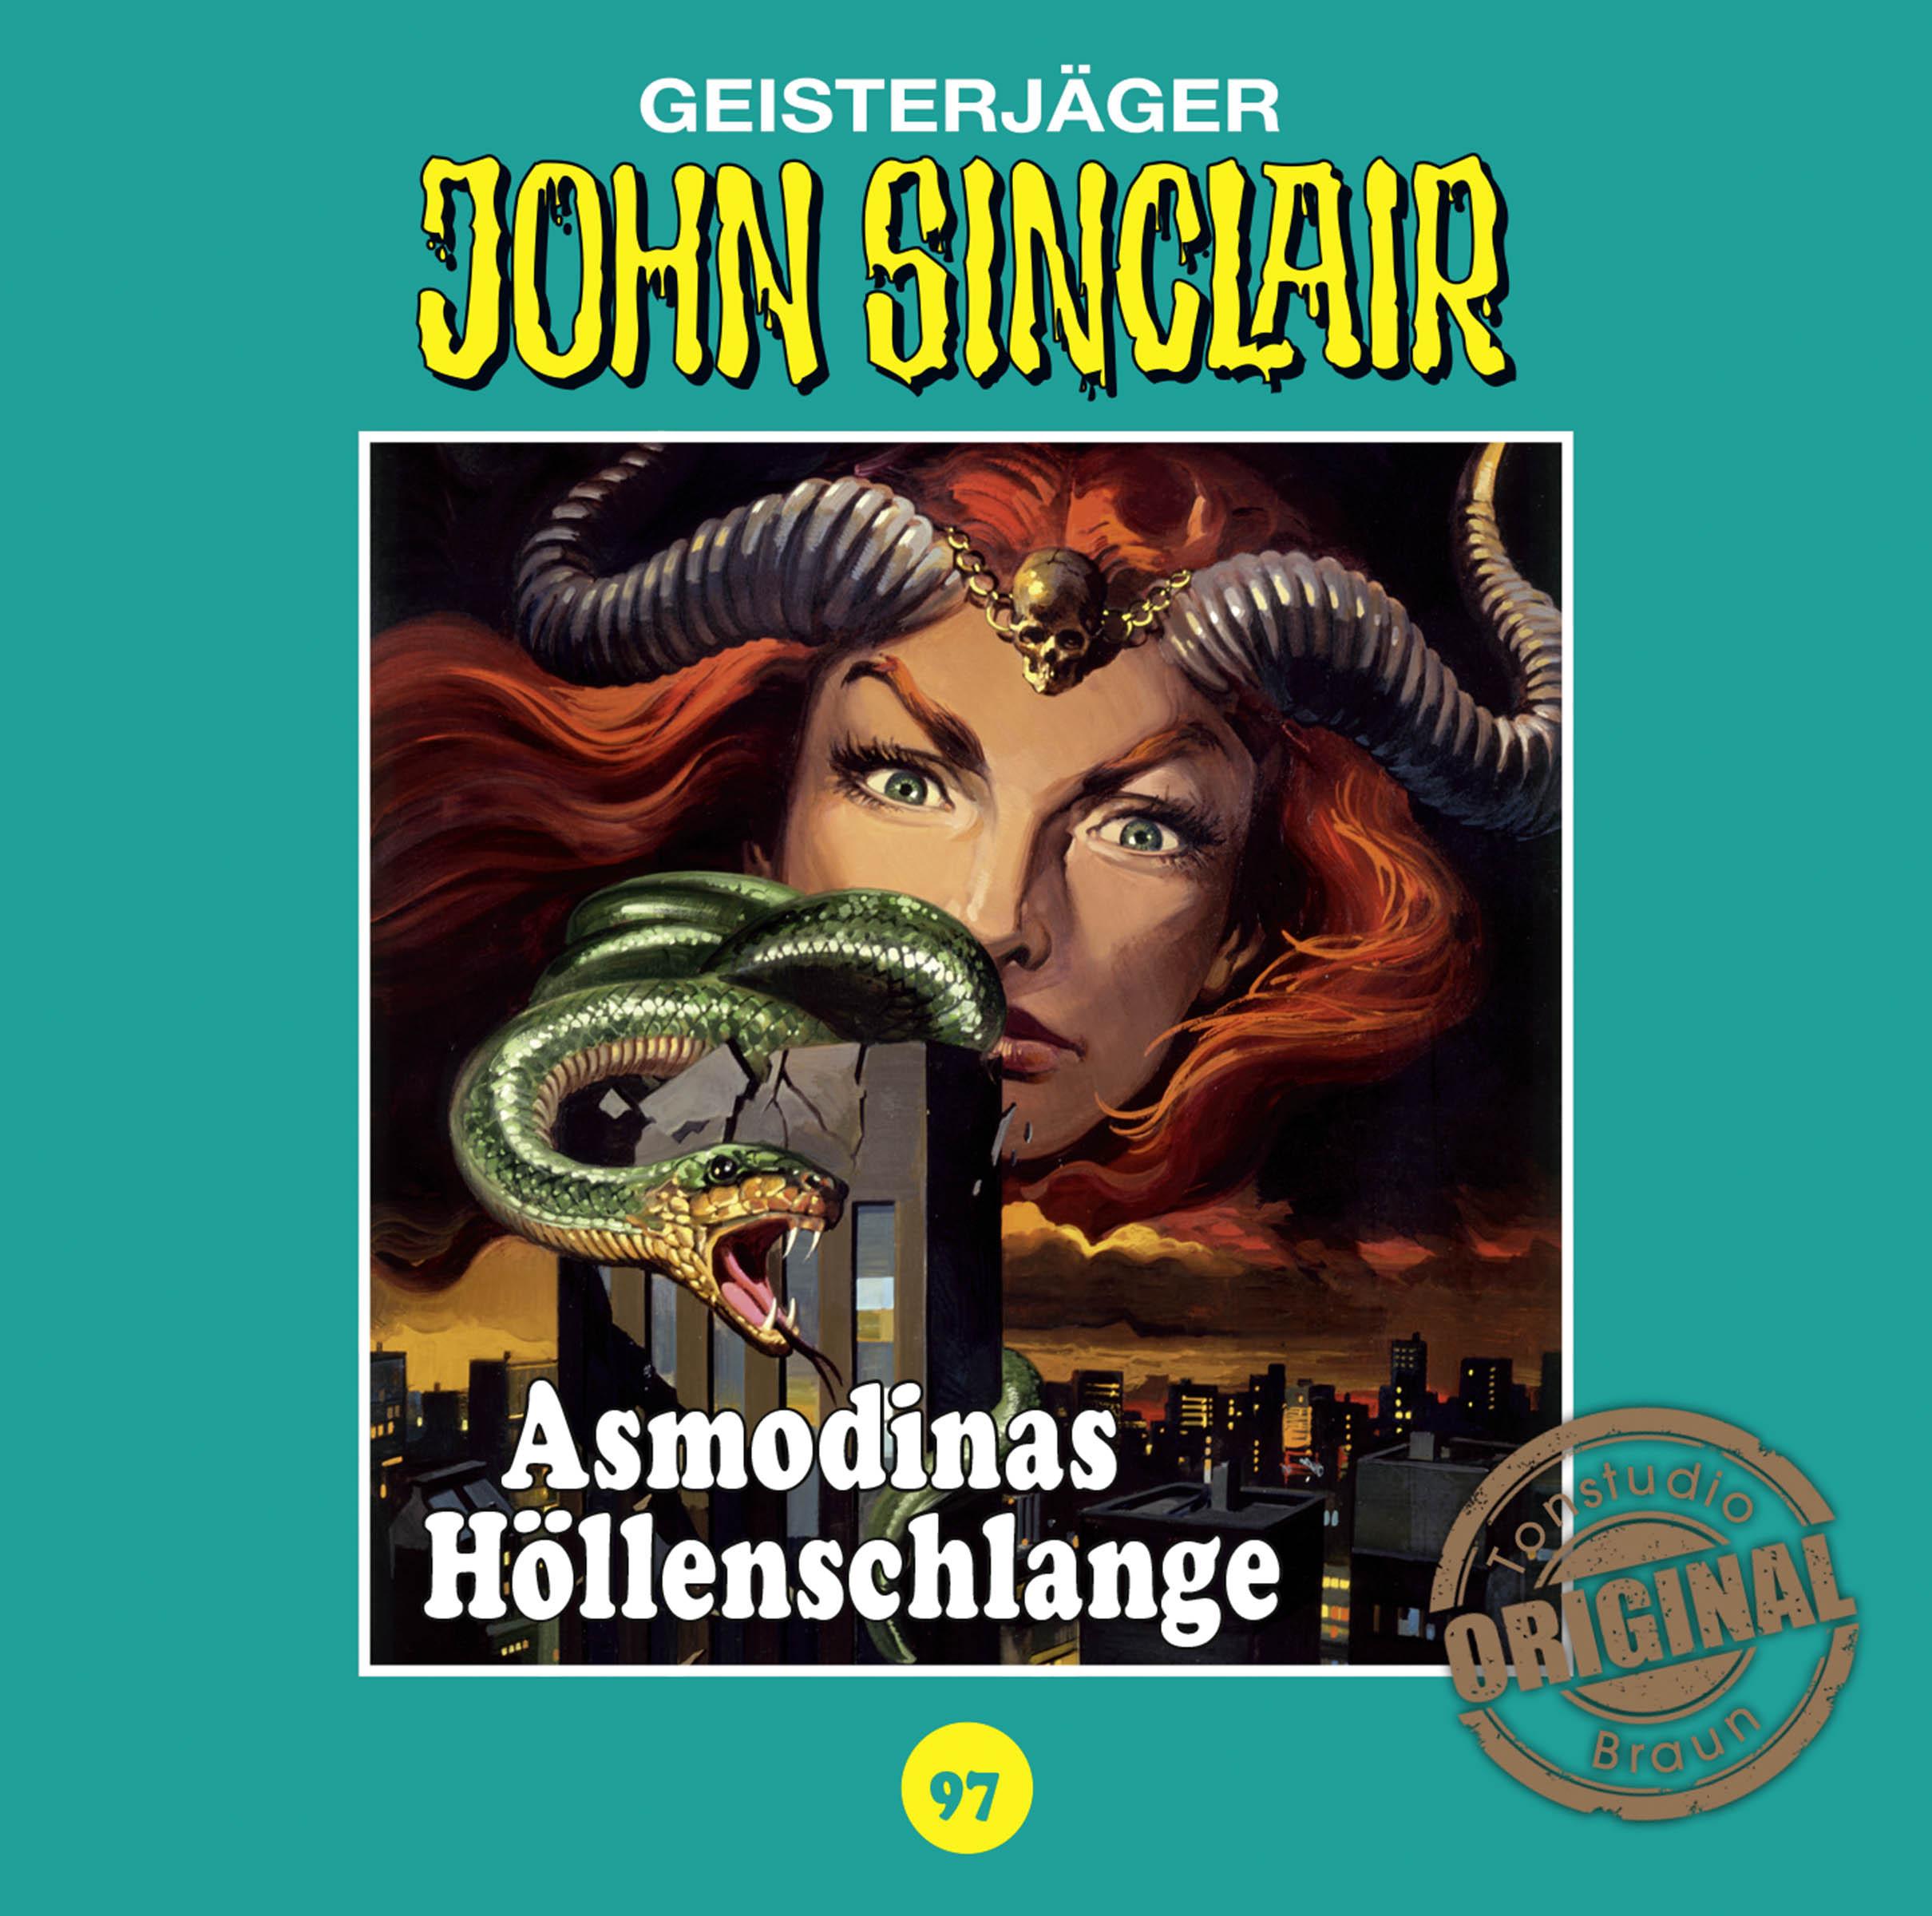 John Sinclair Tonstudio Braun - Folge 97: Asmodinas Höllenschlange